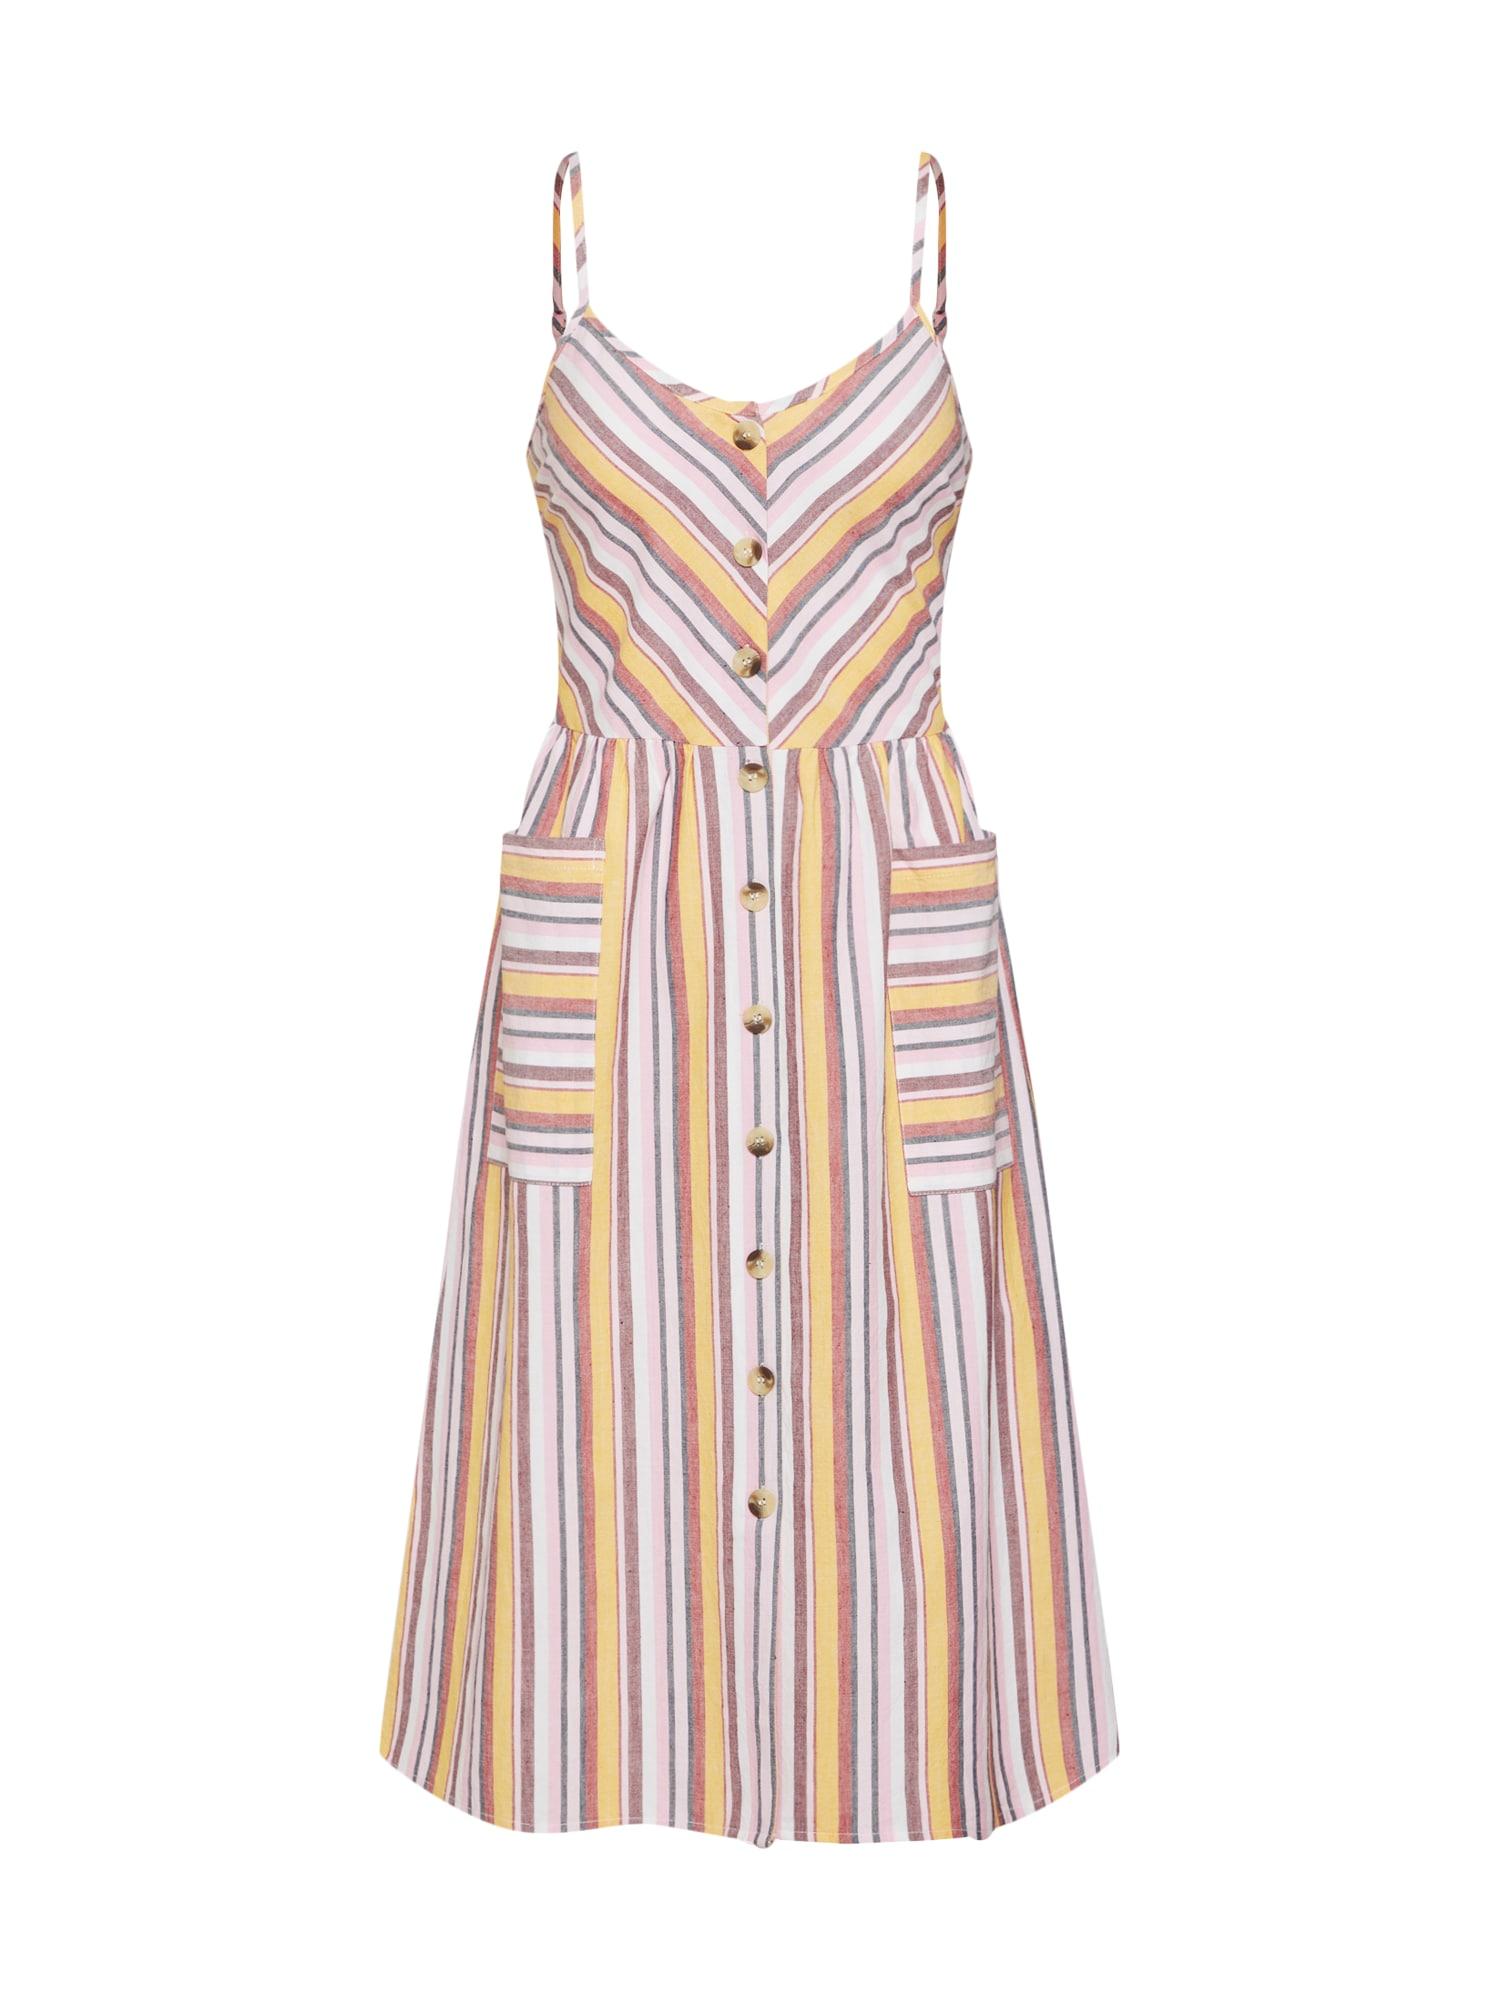 Letní šaty žlutá růžová bílá Boohoo